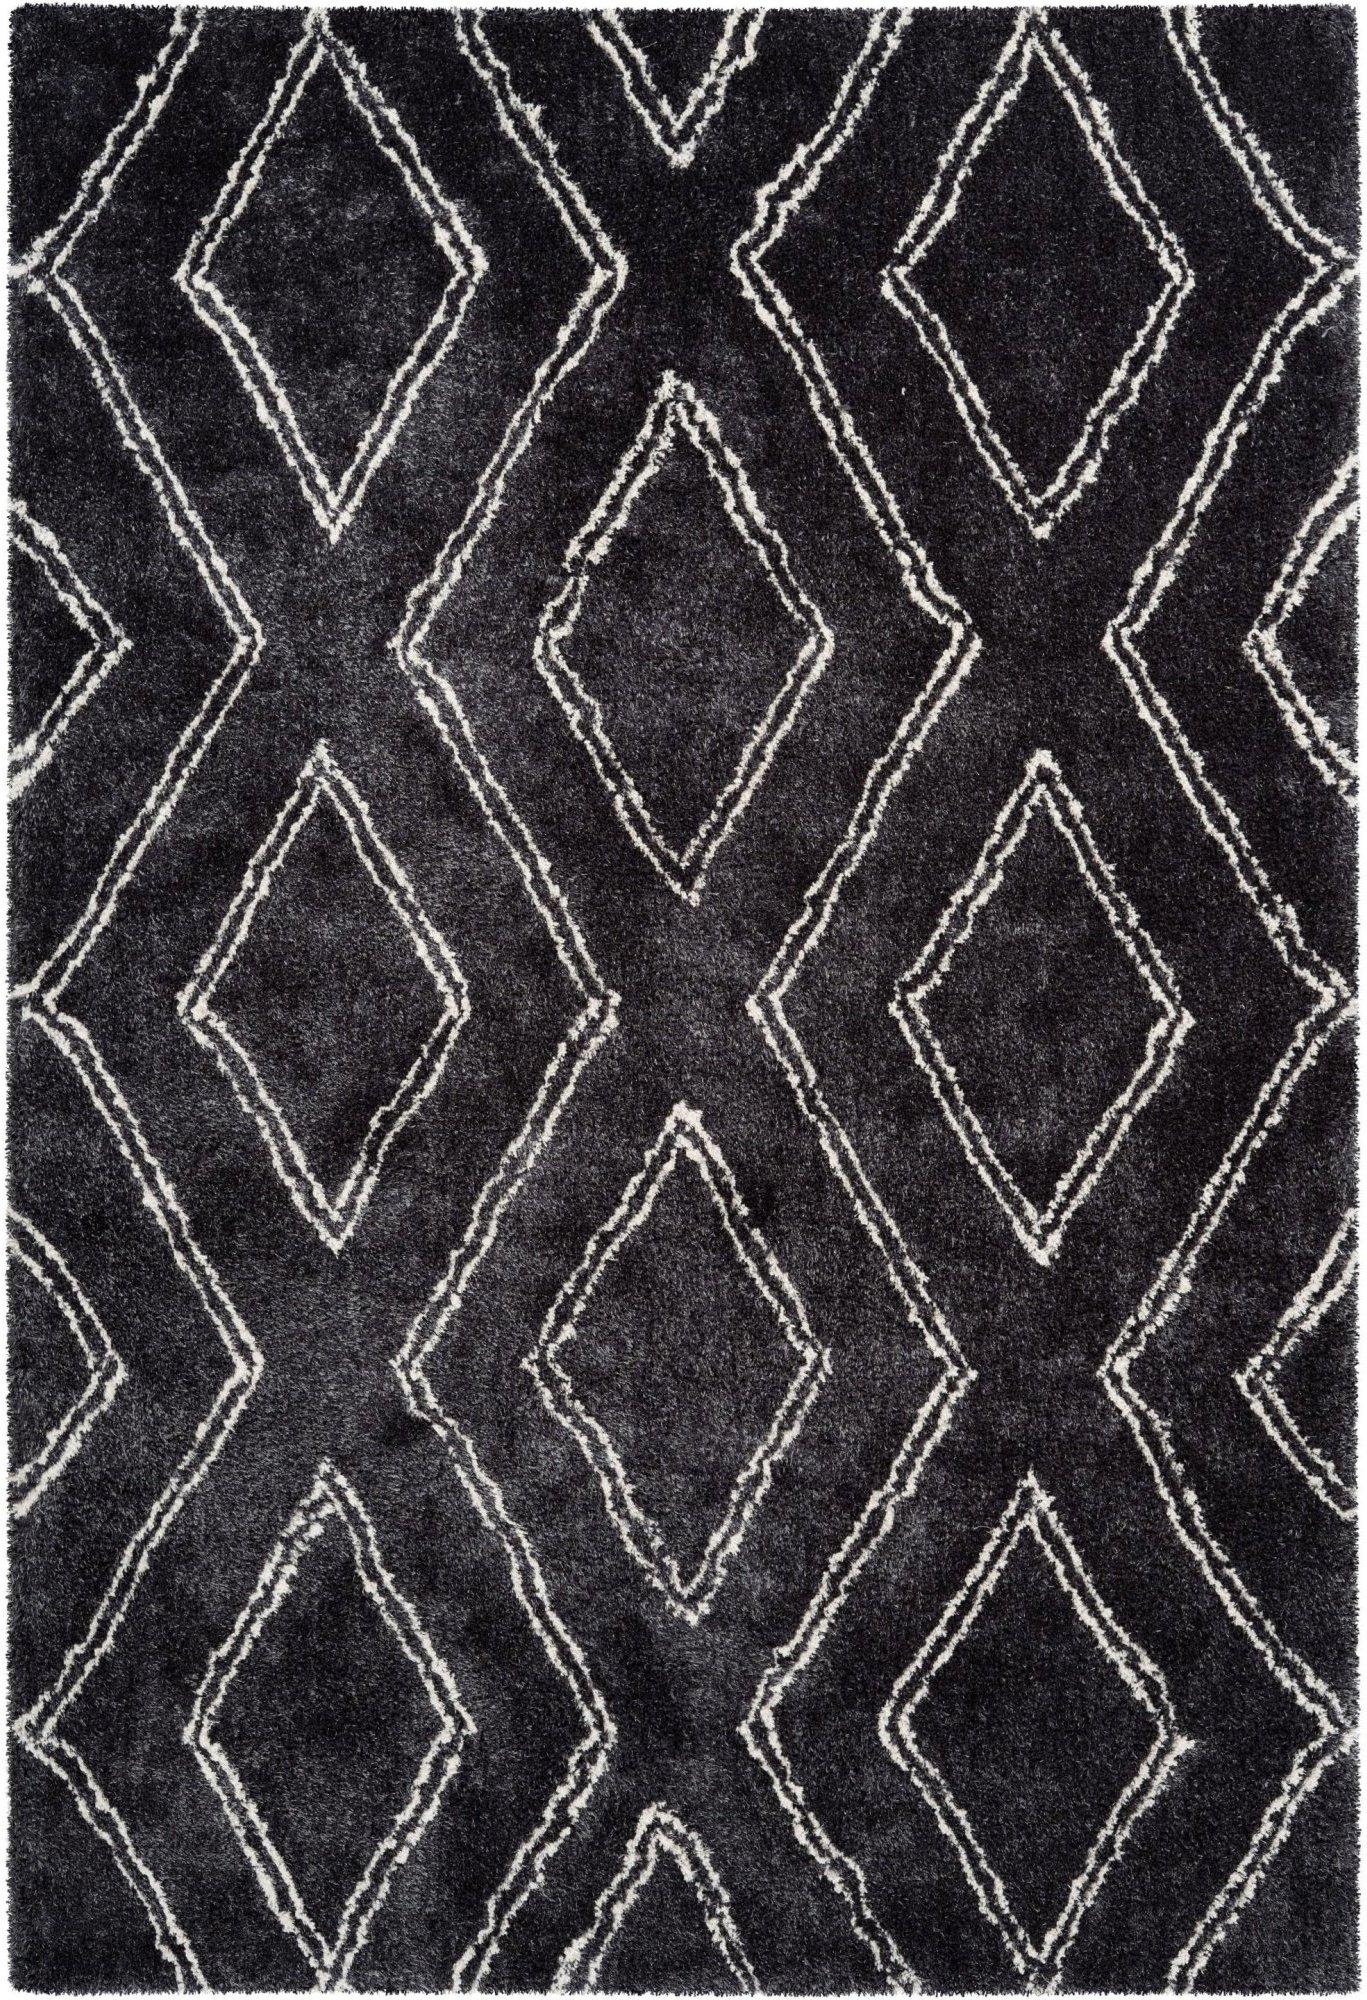 Tapis en polyester anthracite 160x230